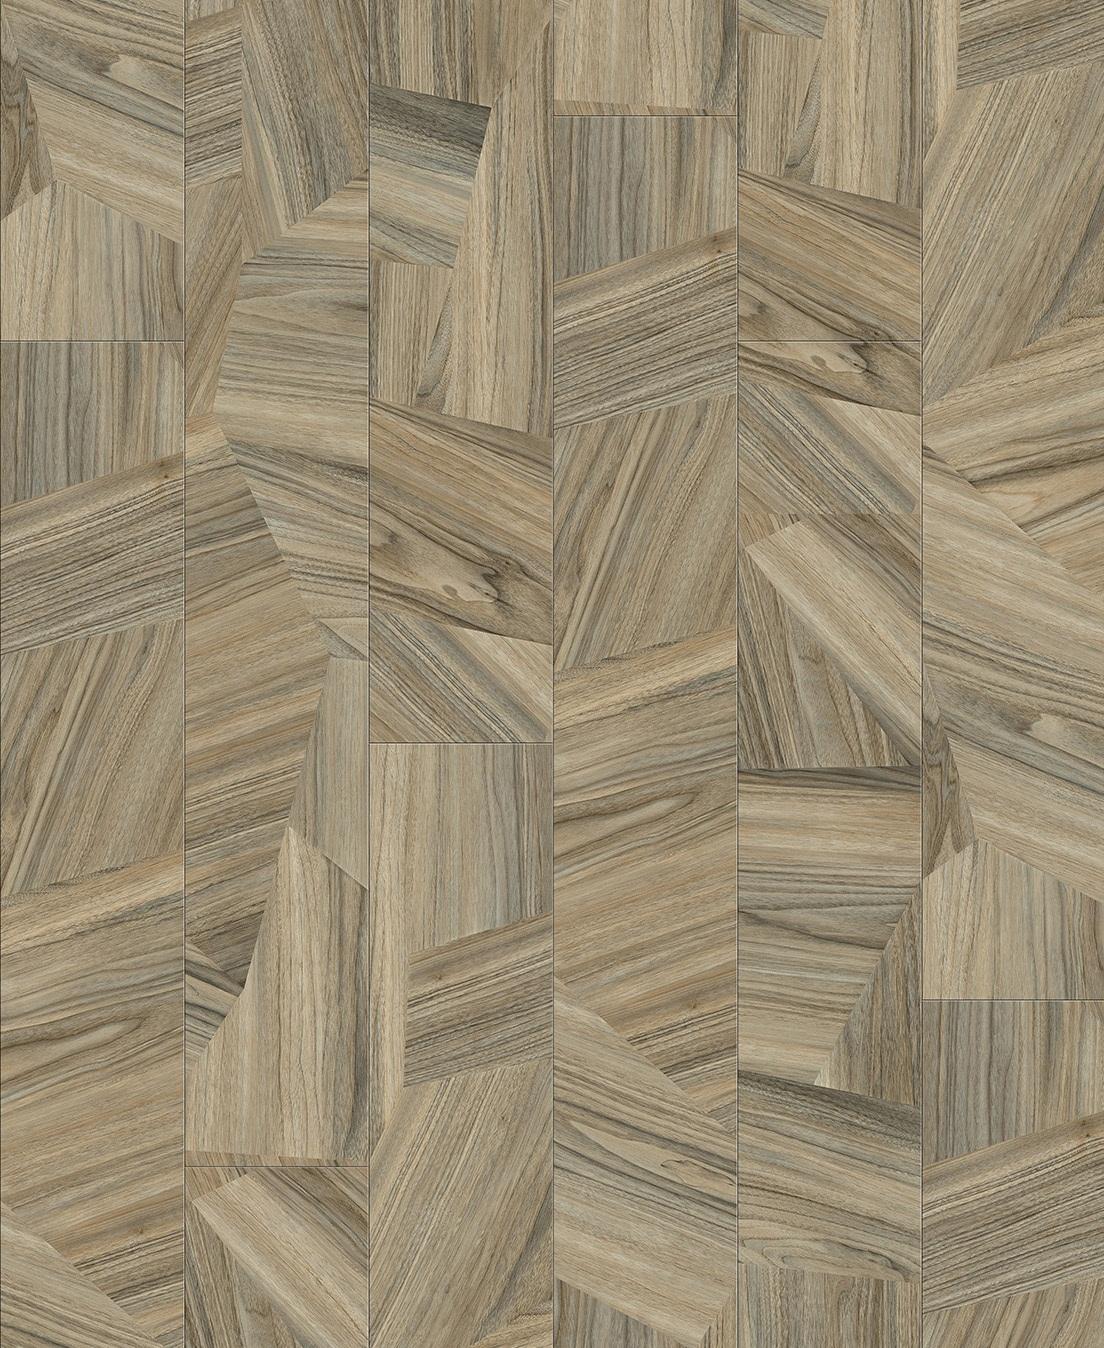 New Arrival Luxury Quality Best Design PVC Floor/Vinyl Floor 6805-2